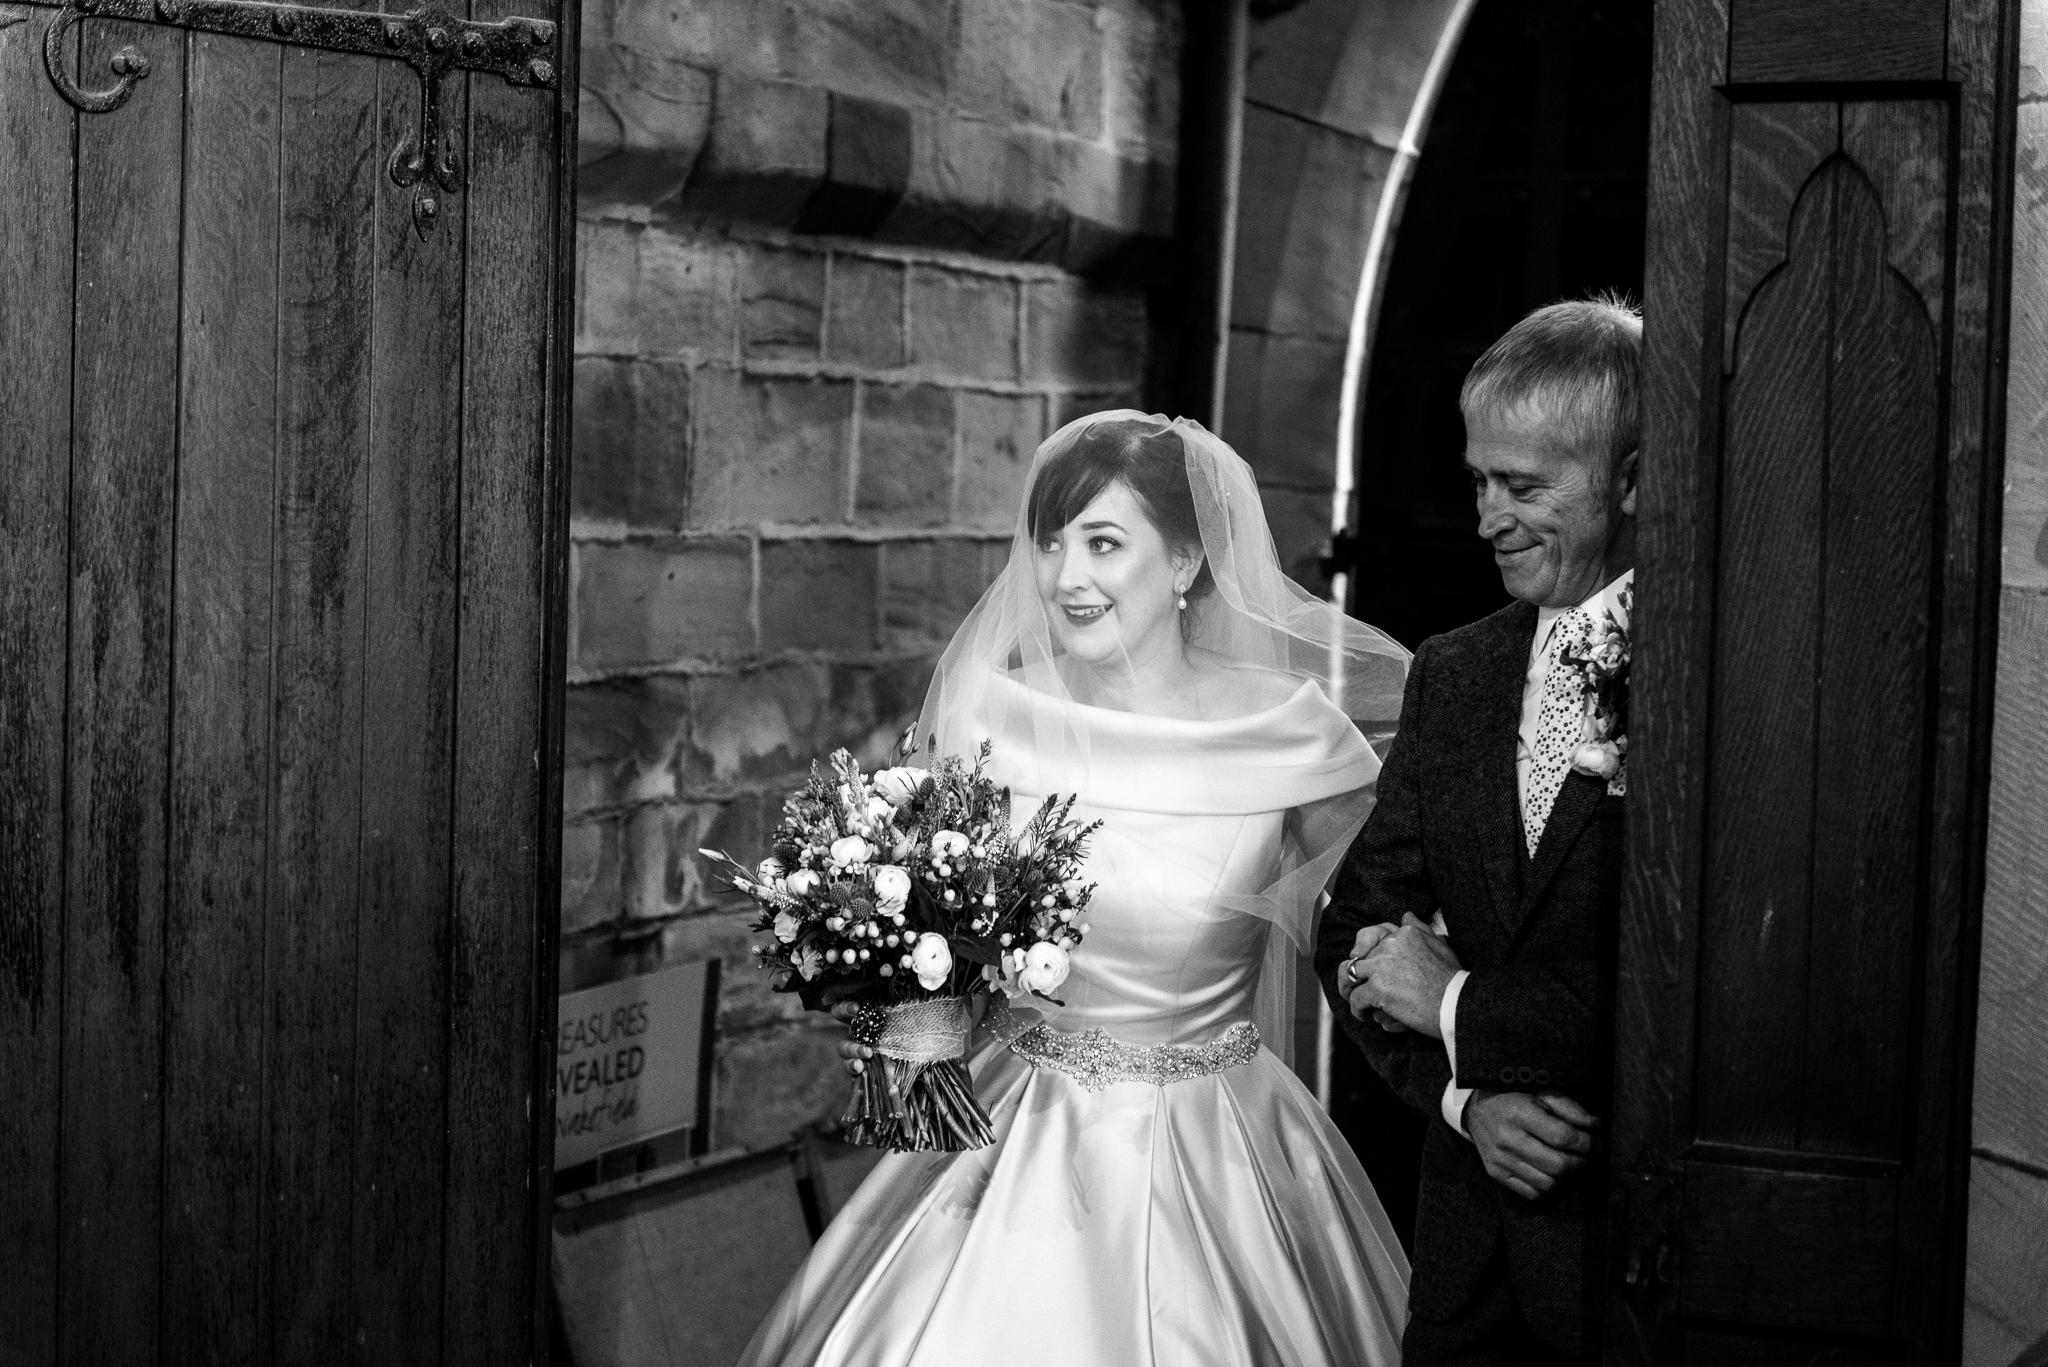 Yorkshire Wedding Photography Spring Wedding Cubley Hall Rustic Barn-25.jpg